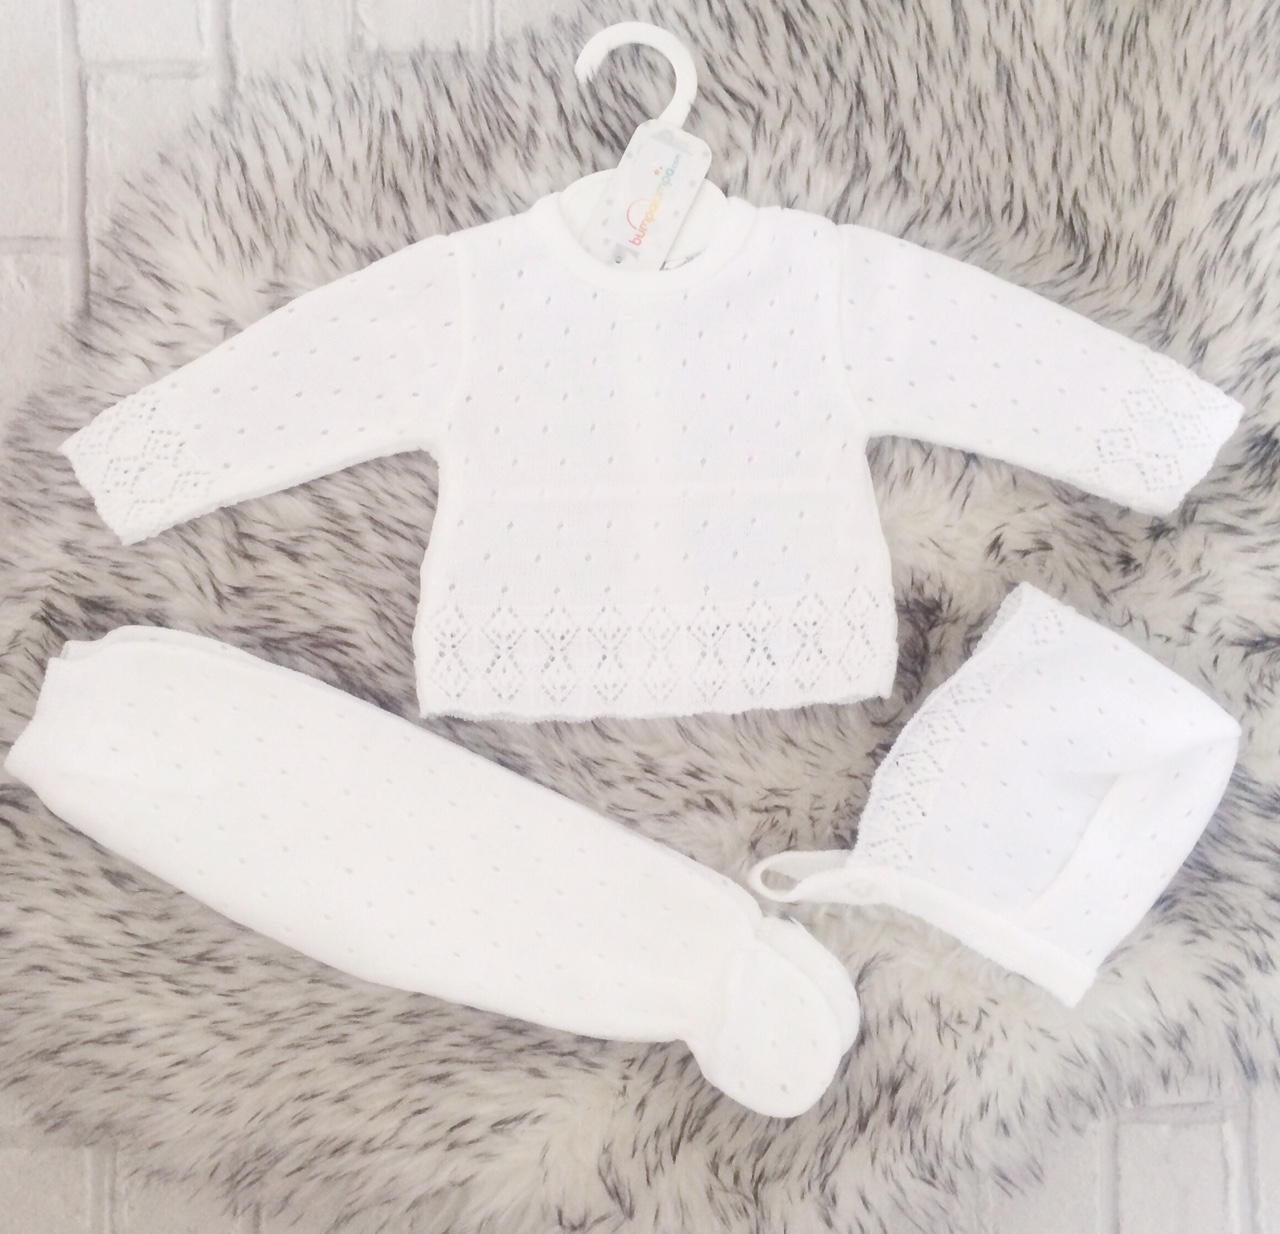 289bc0174 Unisex White Knitted Baby Pram Set